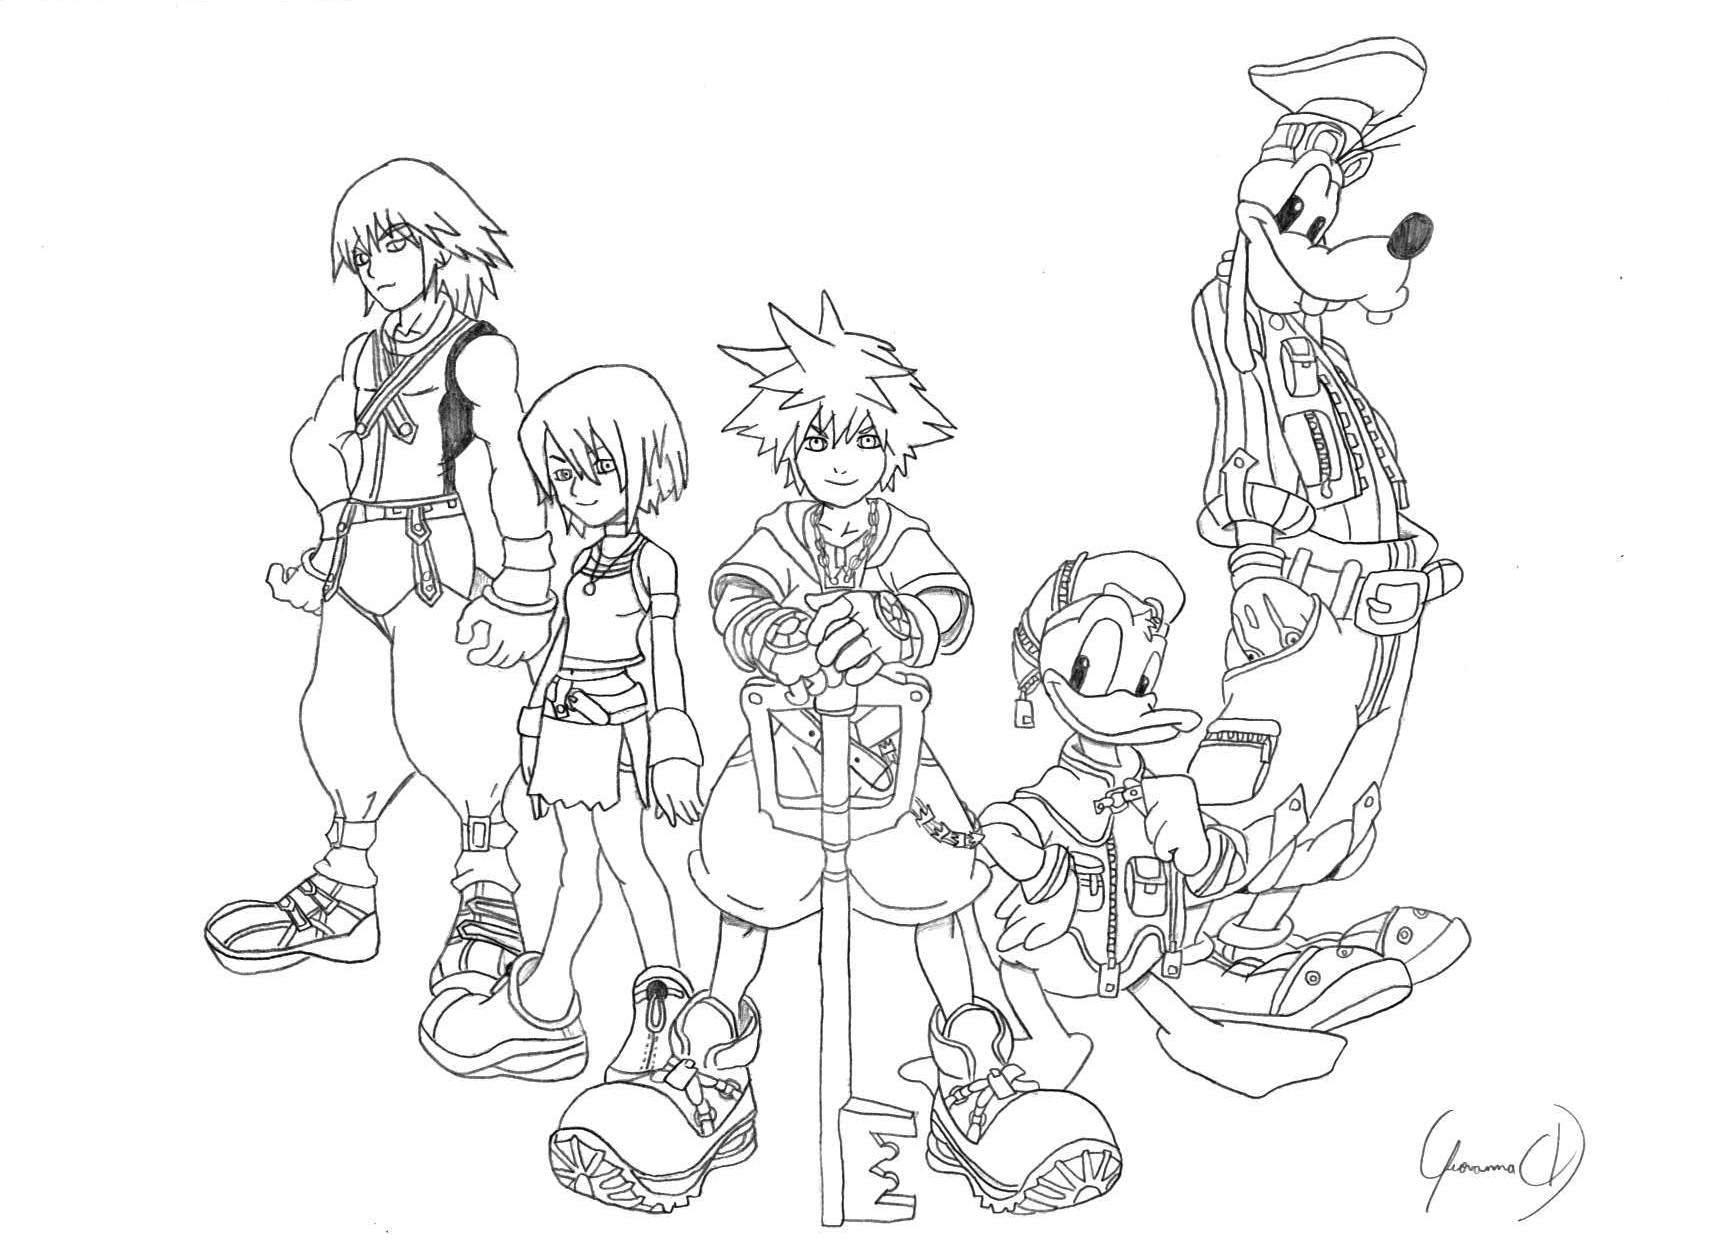 How To Draw Kingdom Hearts Characters Www Picsbud Com